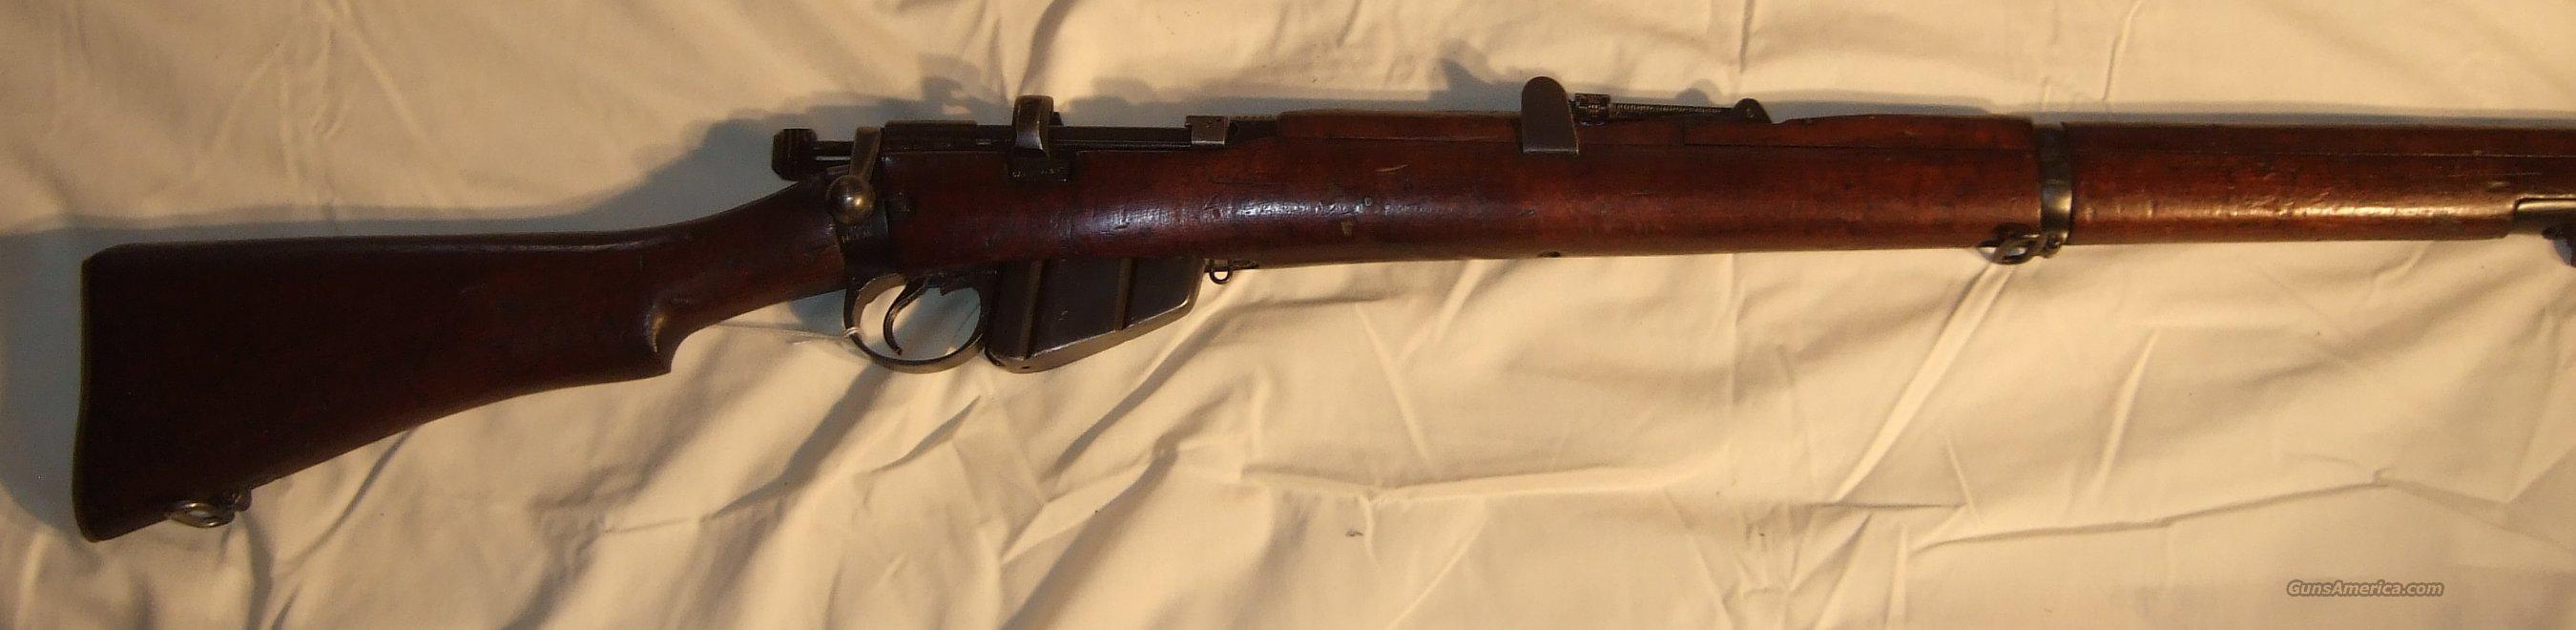 Enfield SMLE No. 1 Mk III  Guns > Rifles > Enfield Rifle